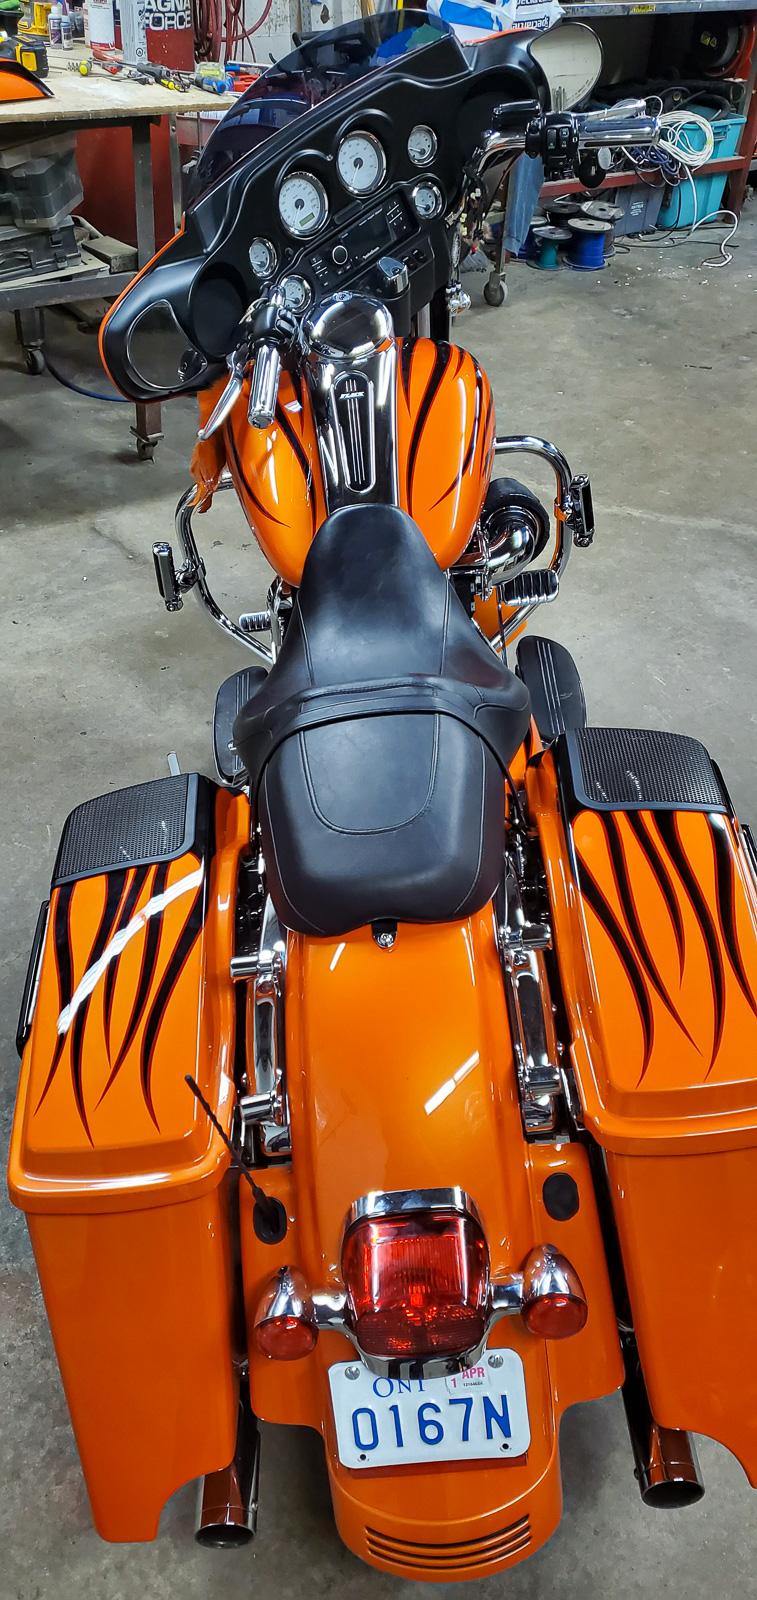 установка музыки на мотоцикл Харлей Дэвидсон